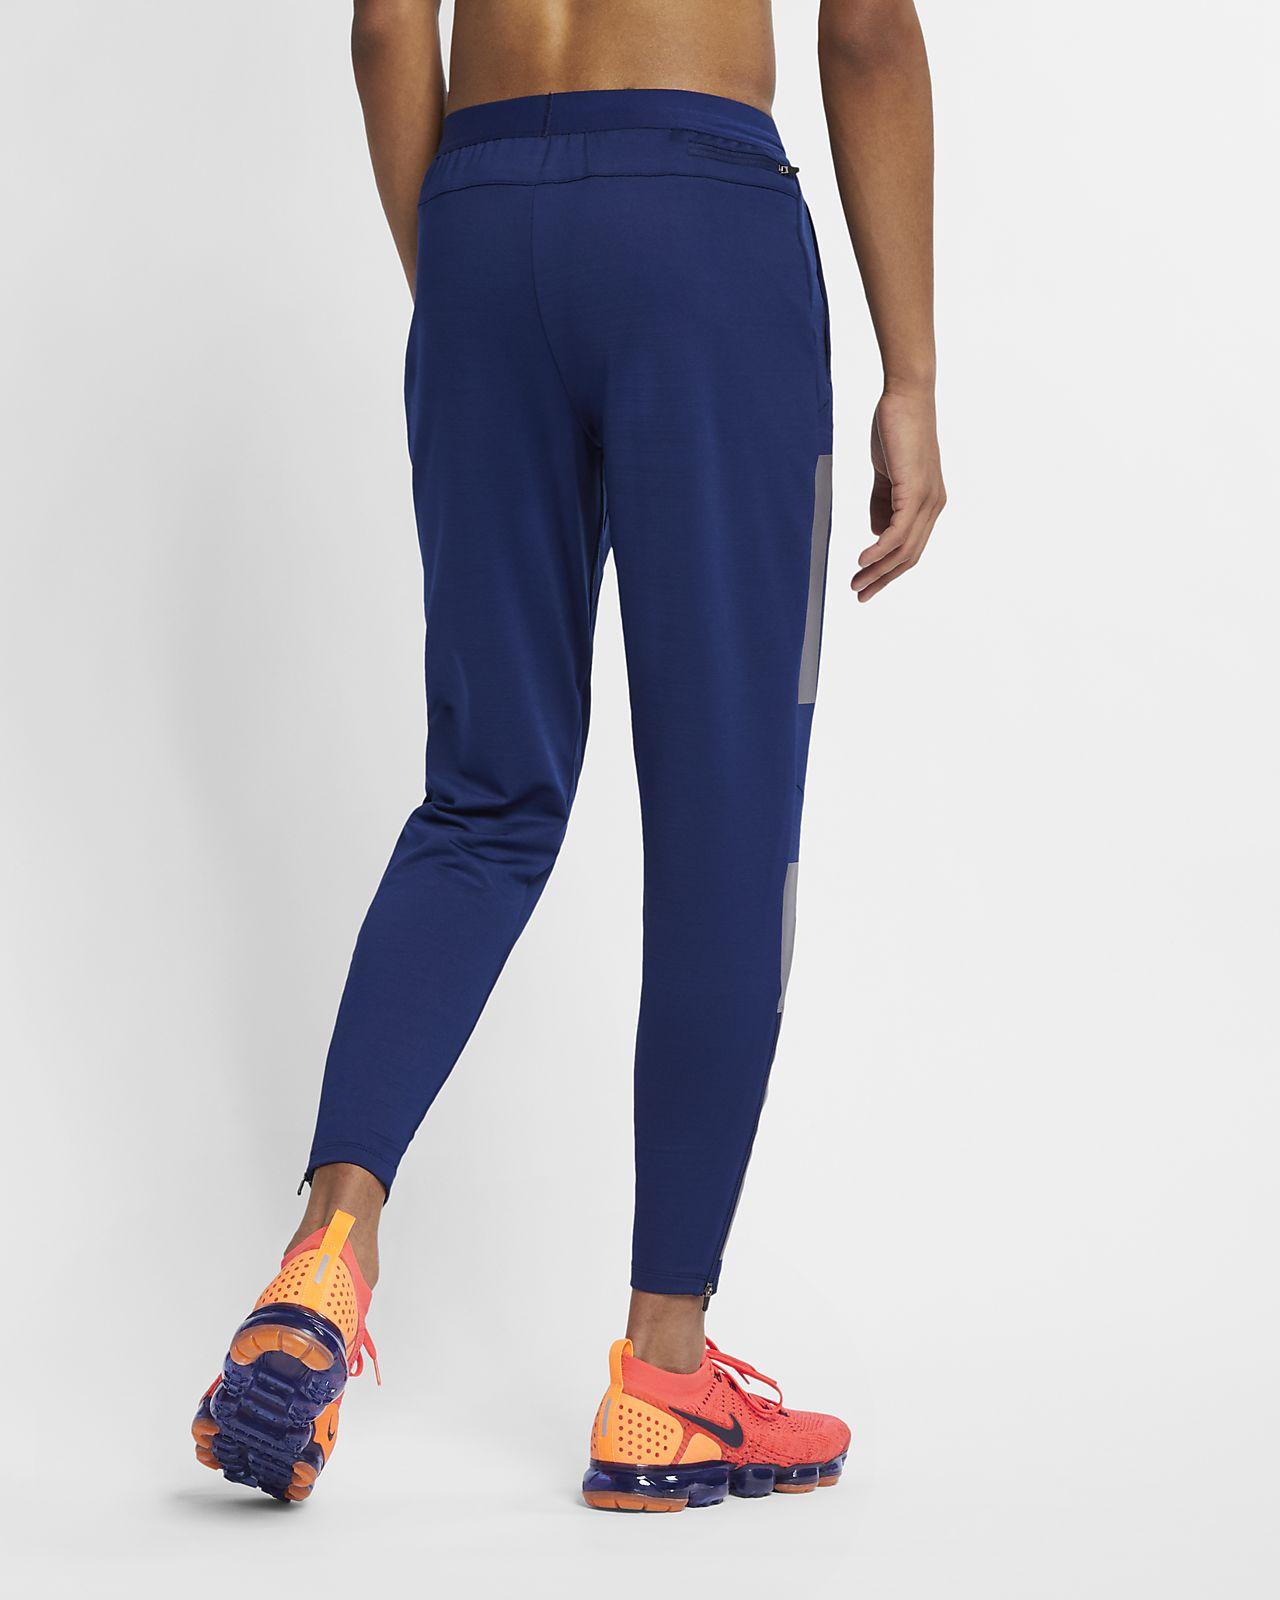 a85423363ba5 Low Resolution Nike Phenom Men s Running Trousers Nike Phenom Men s Running  Trousers